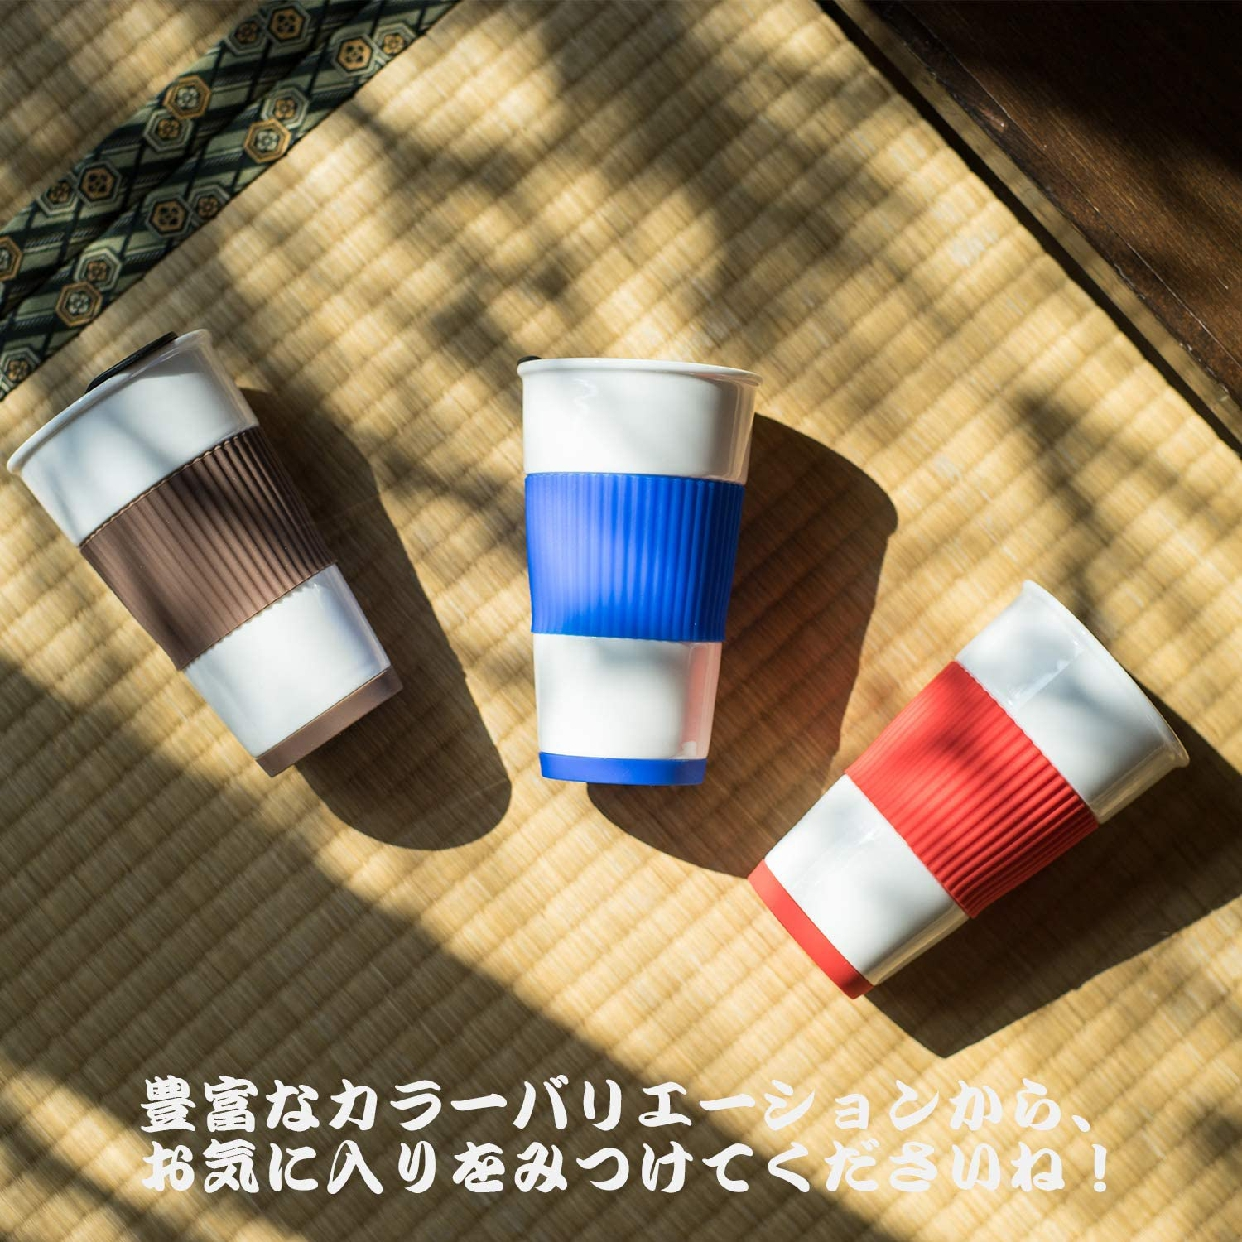 UDMG(ユーディーエムジー) 二重構造断熱コーヒーカップの商品画像8